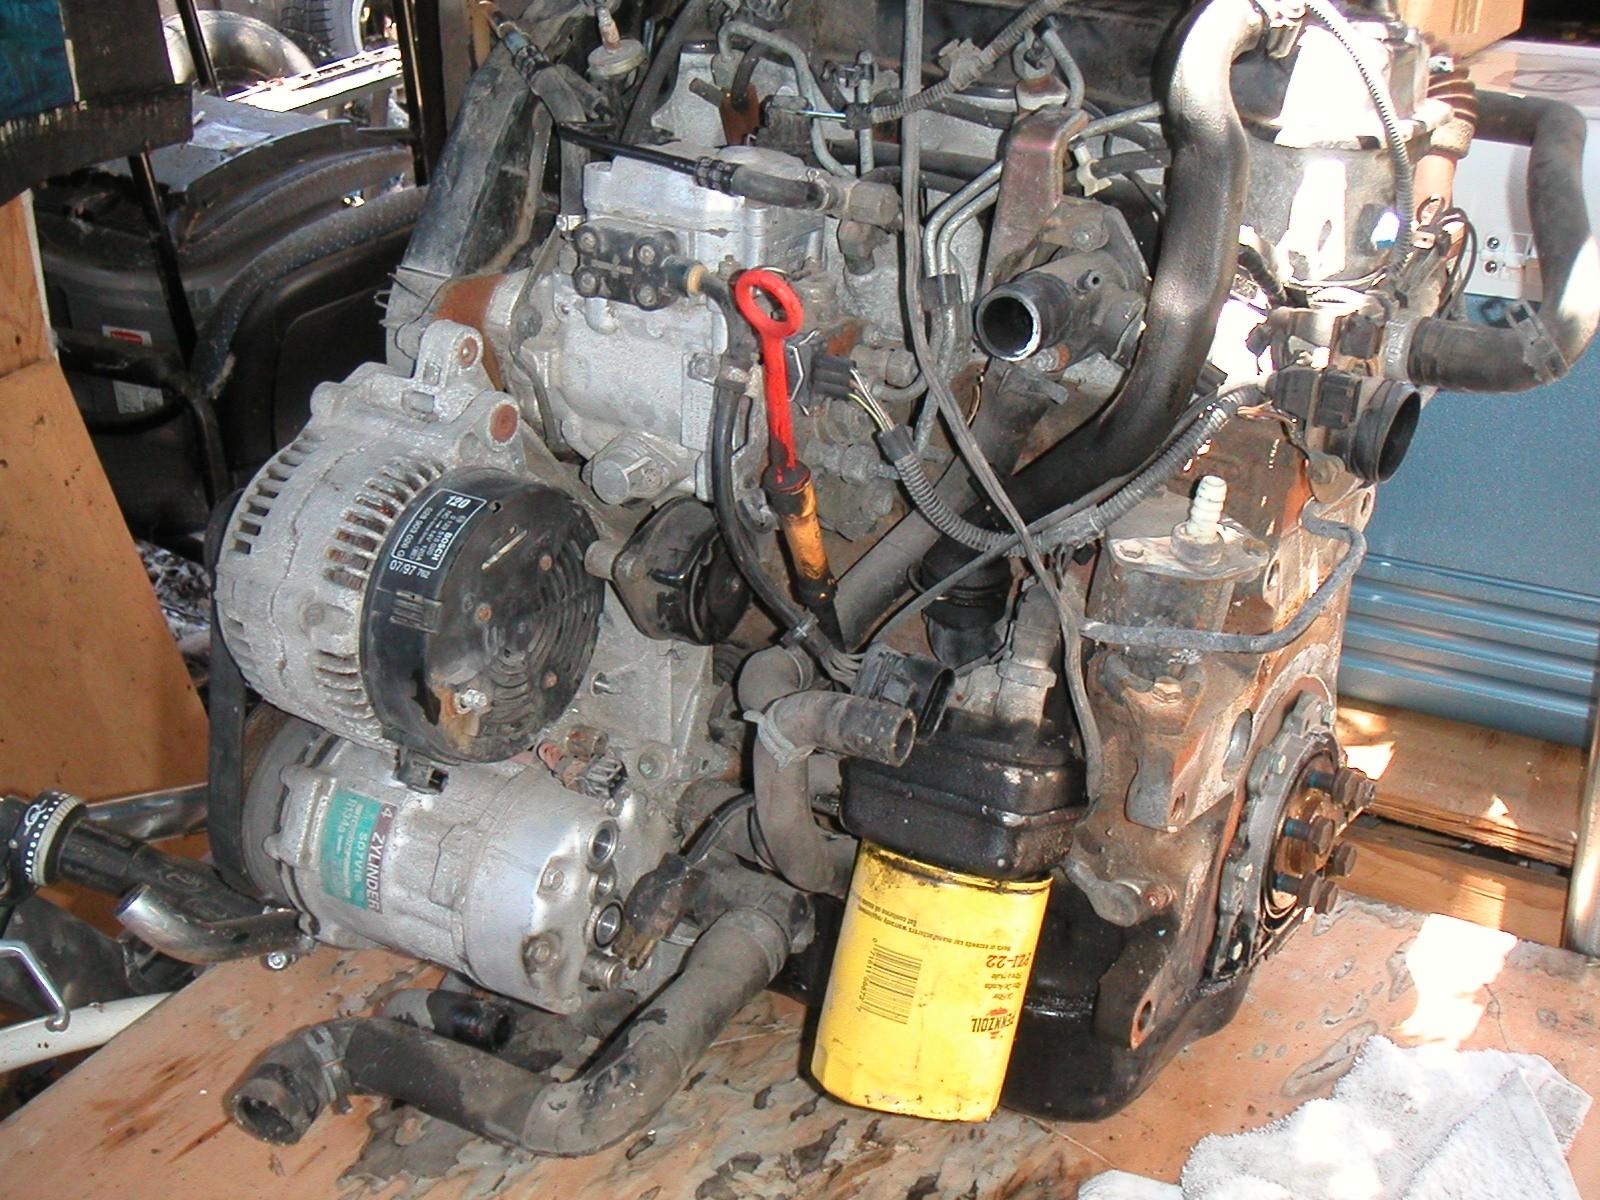 2001 vw jetta vr6 engine diagram i need help please 2001 vw jetta rh detoxicrecenze com 2011 Volkswagen Jetta Engine Diagram 2011 Volkswagen Jetta Engine Diagram